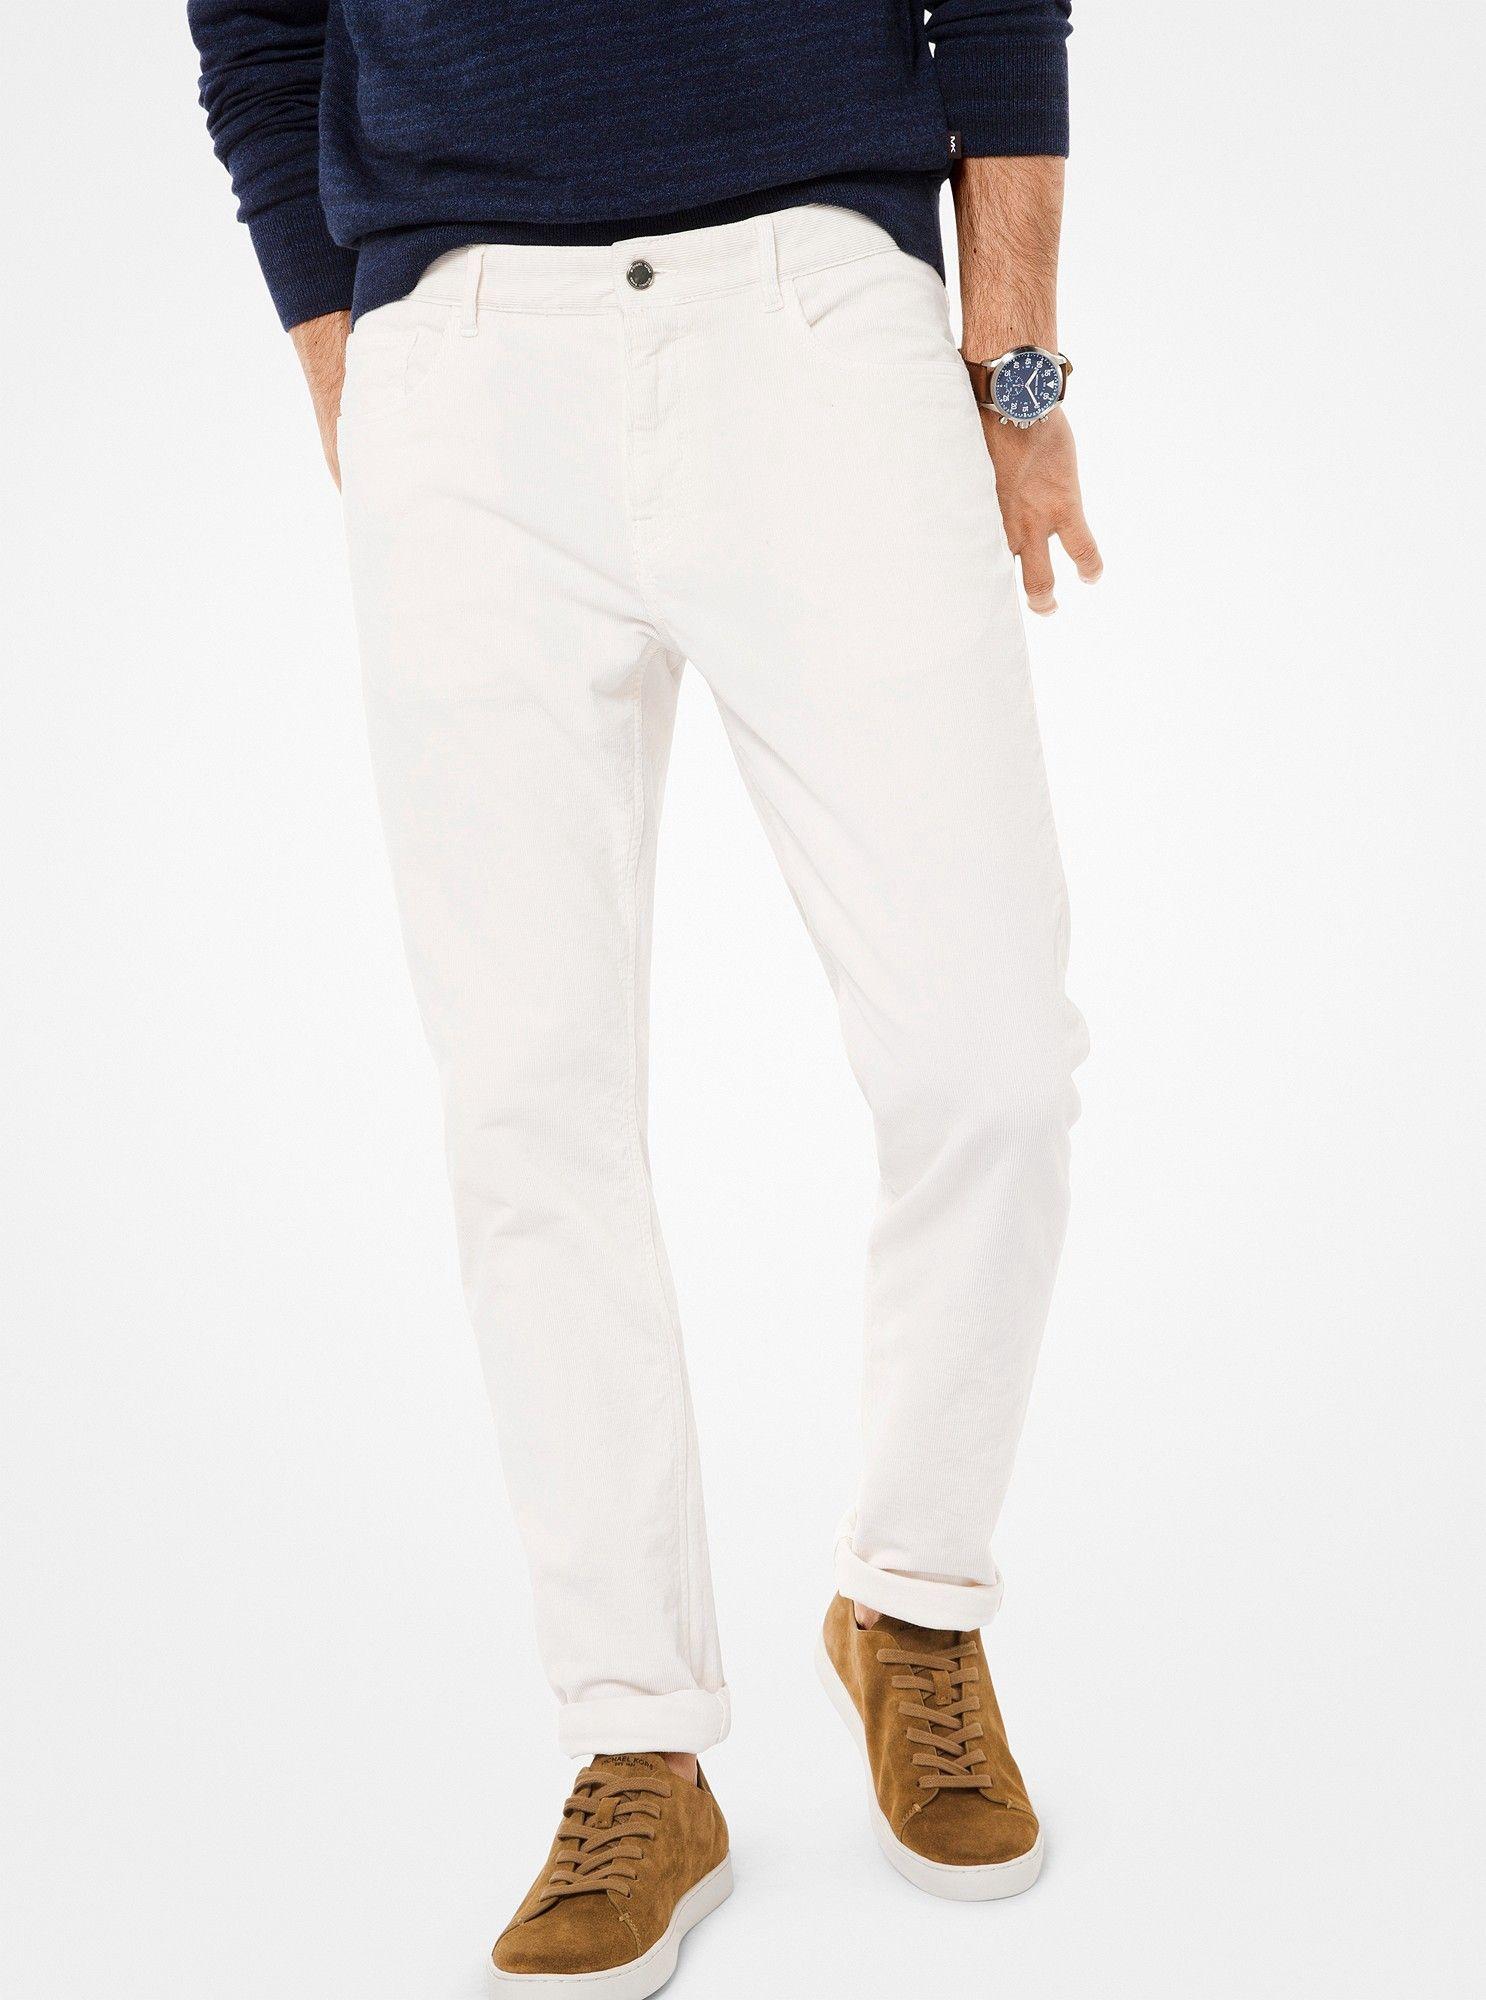 8c3ba683414bdb Michael Kors Parker Slim-Fit Corduroy Pants - Fig Purple 28X30 ...